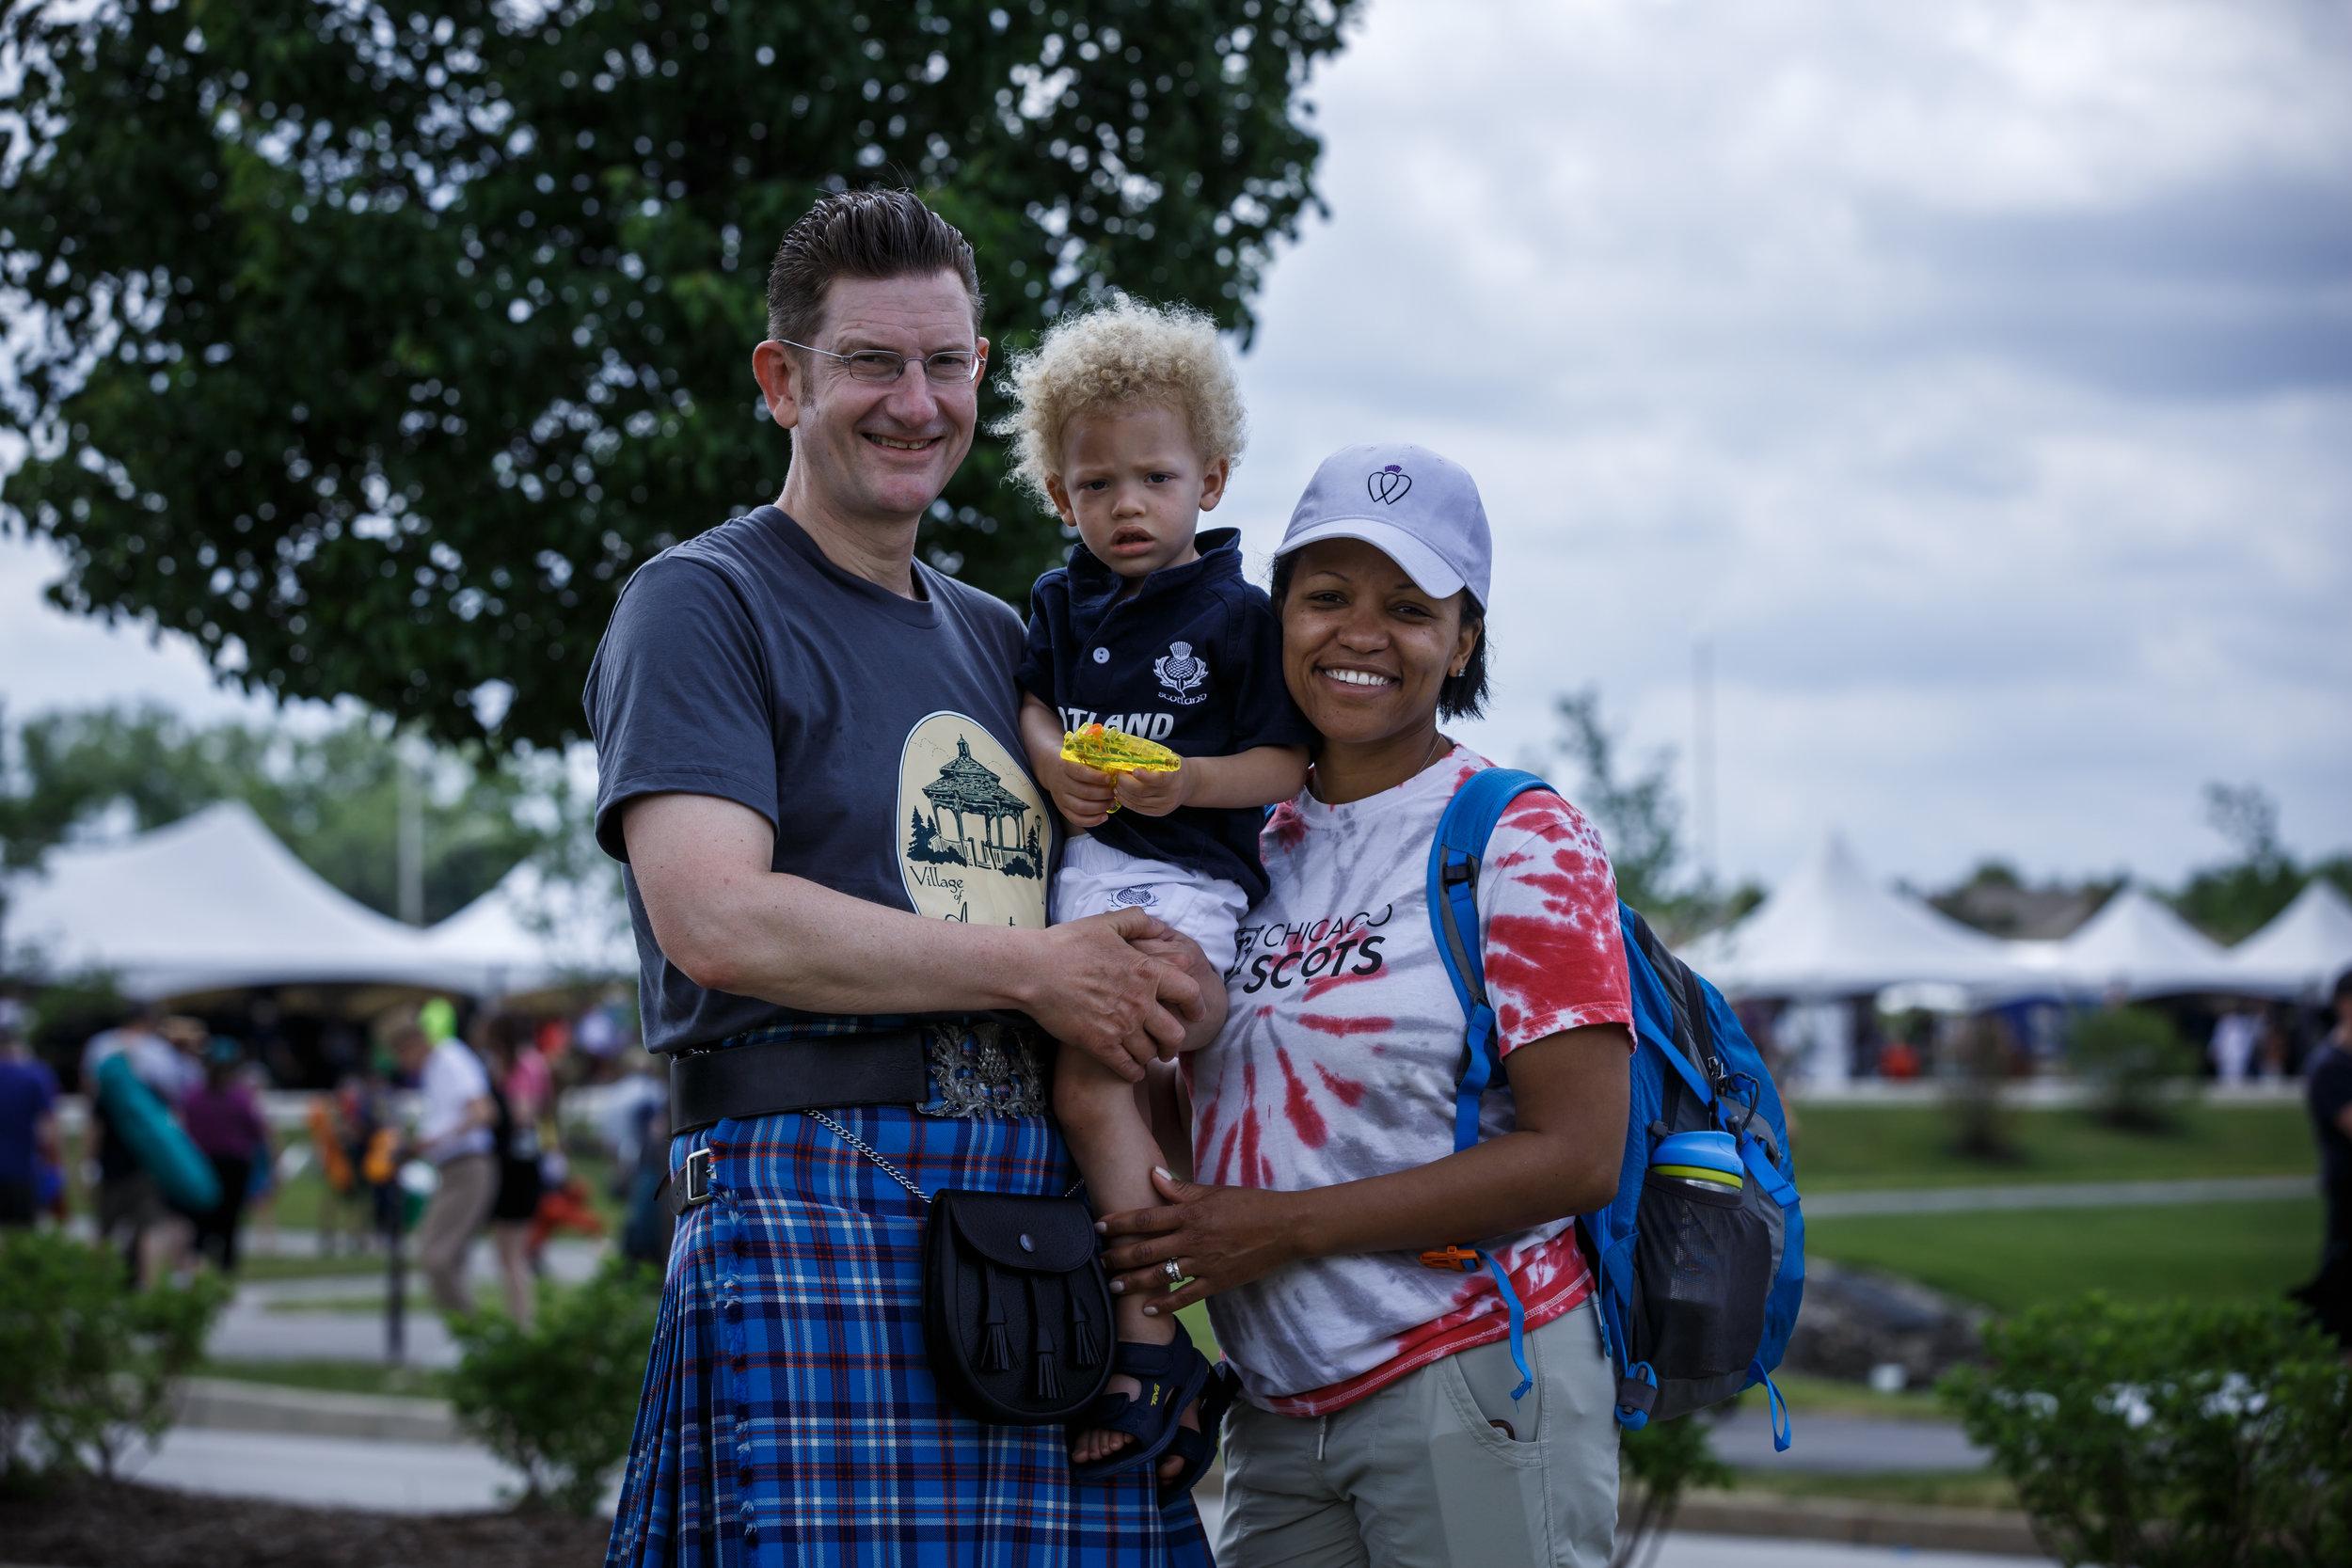 2017 Scottish Festival & Highland Games. Itasca, IL. Gus, Bobby and Aisha Noble.  Photo cred:  James Richards IV